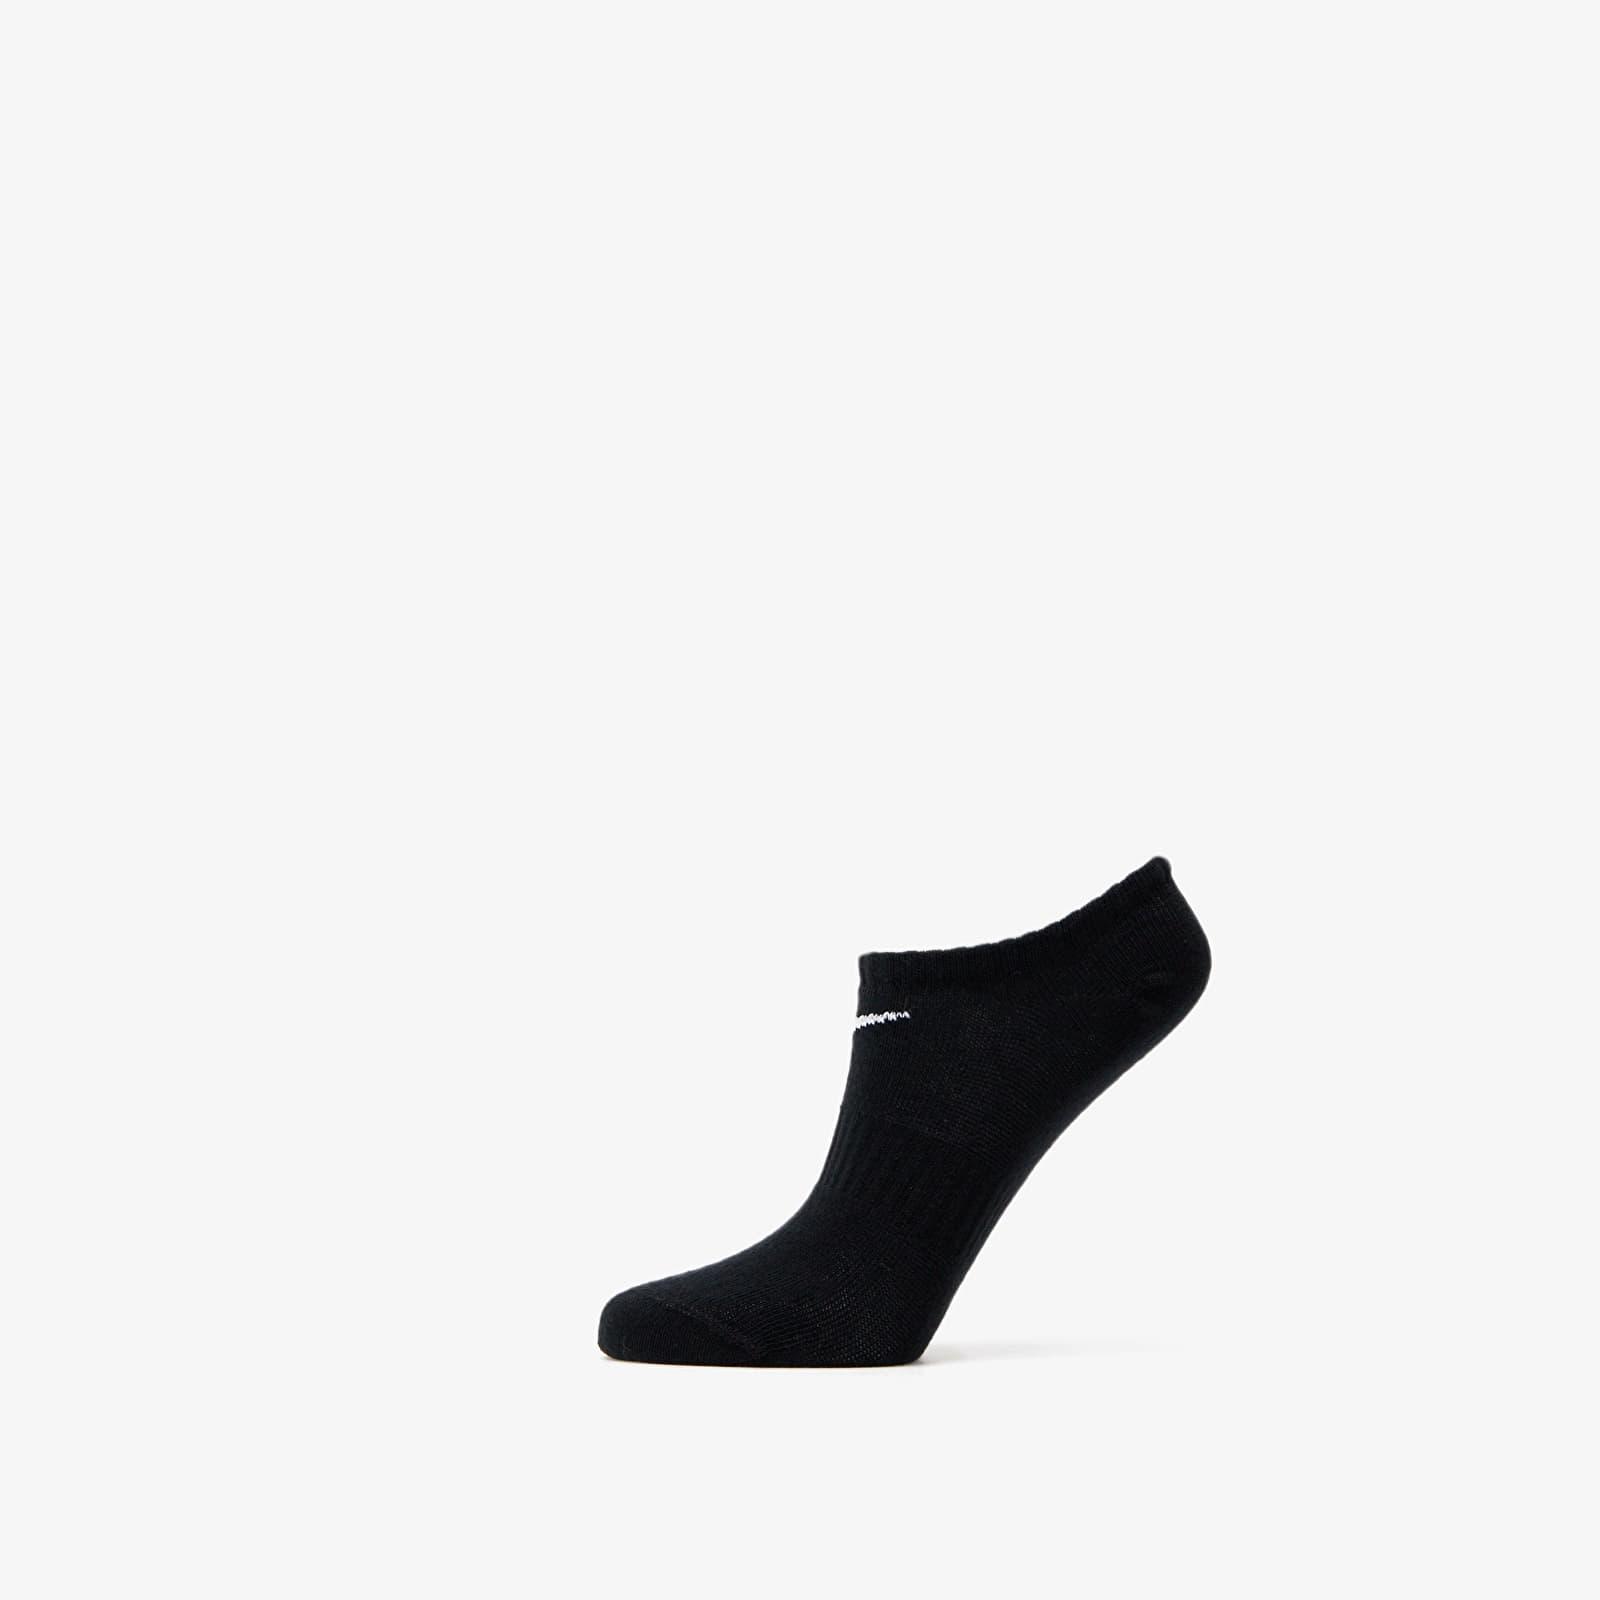 Nike Everyday Cotton Lightweight No Show Socks 3 Pack Black 34-38